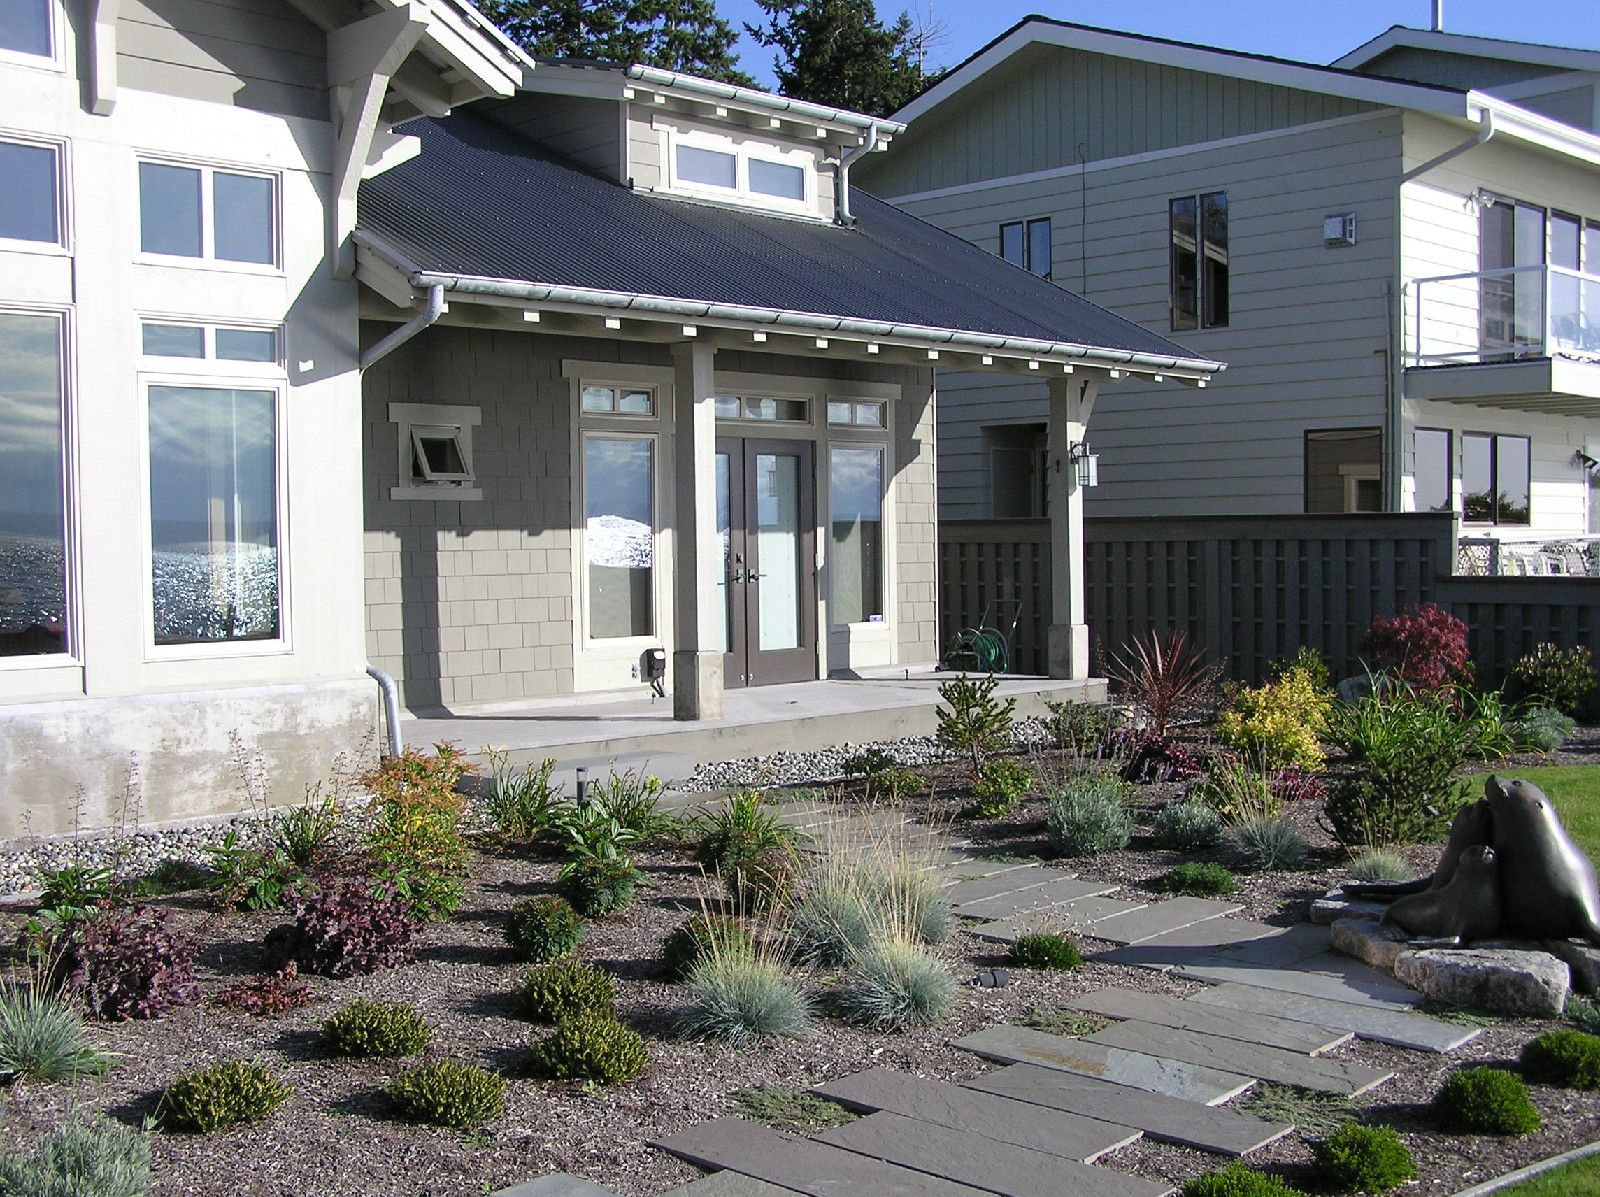 Waterfront Homes | Landscape Architecture Design And Project Management    Seattle Washington | Lankford Associates Inc